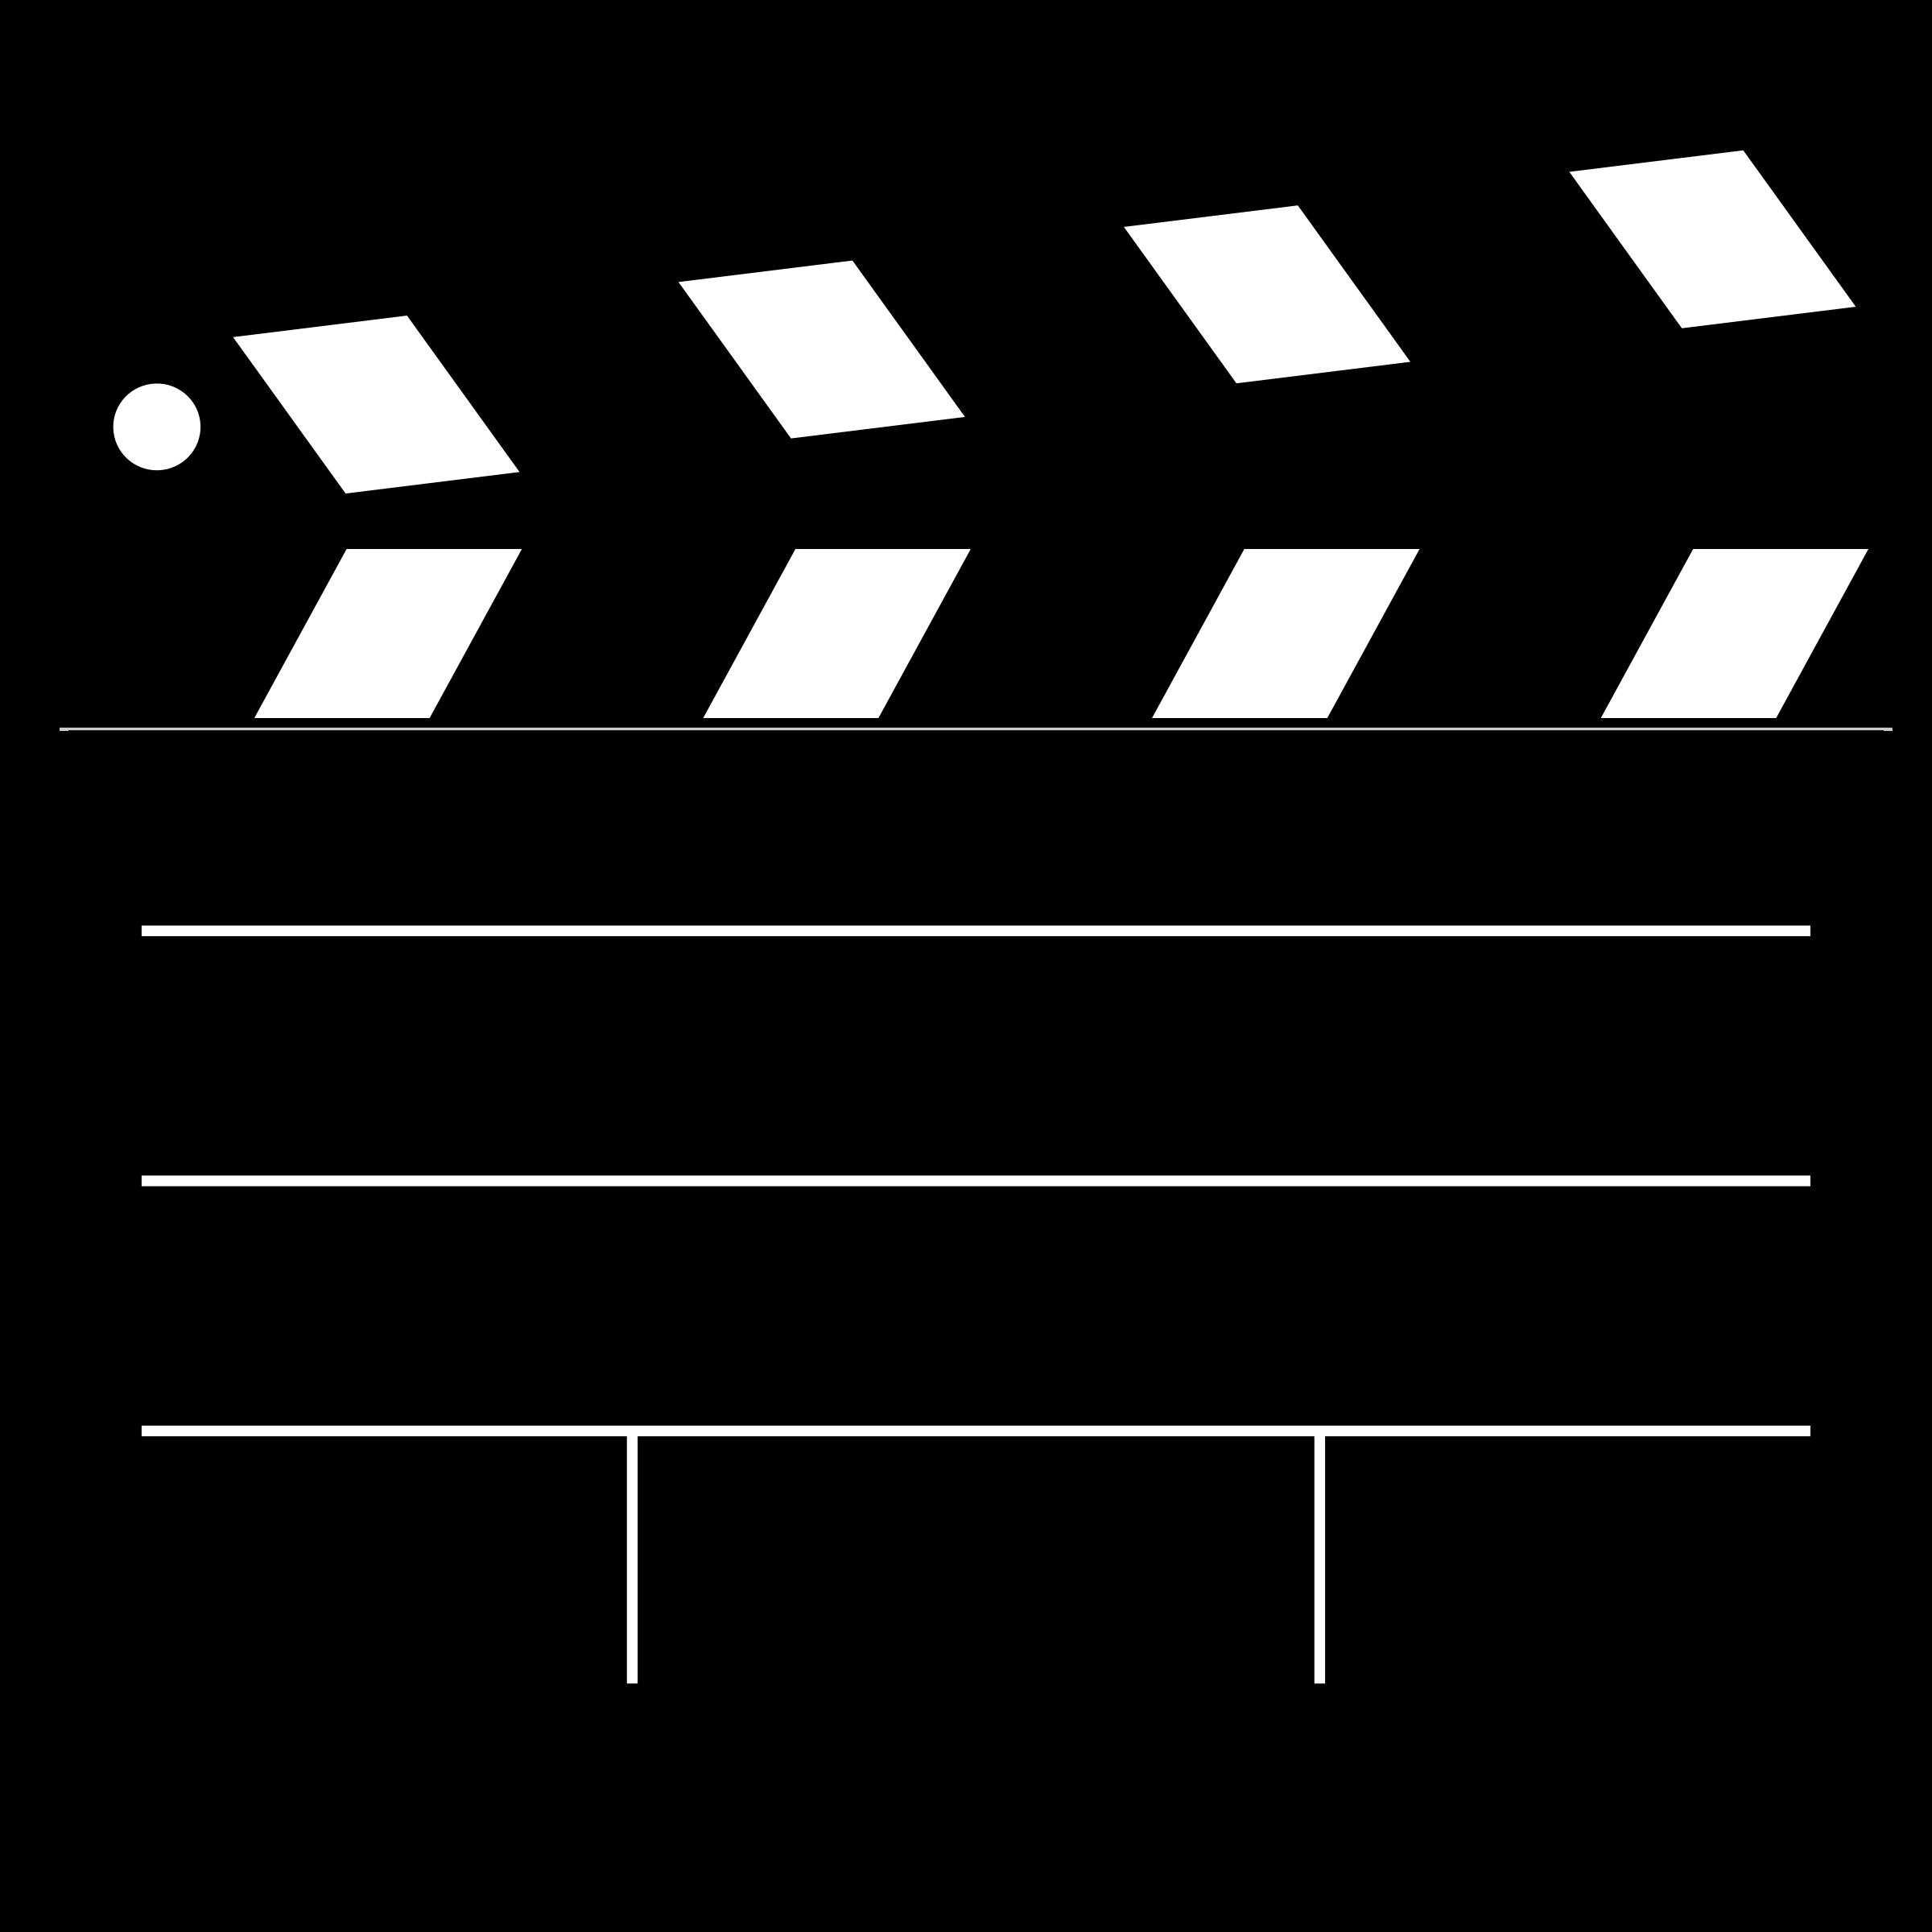 Clapper board big image. Movies clipart film slate